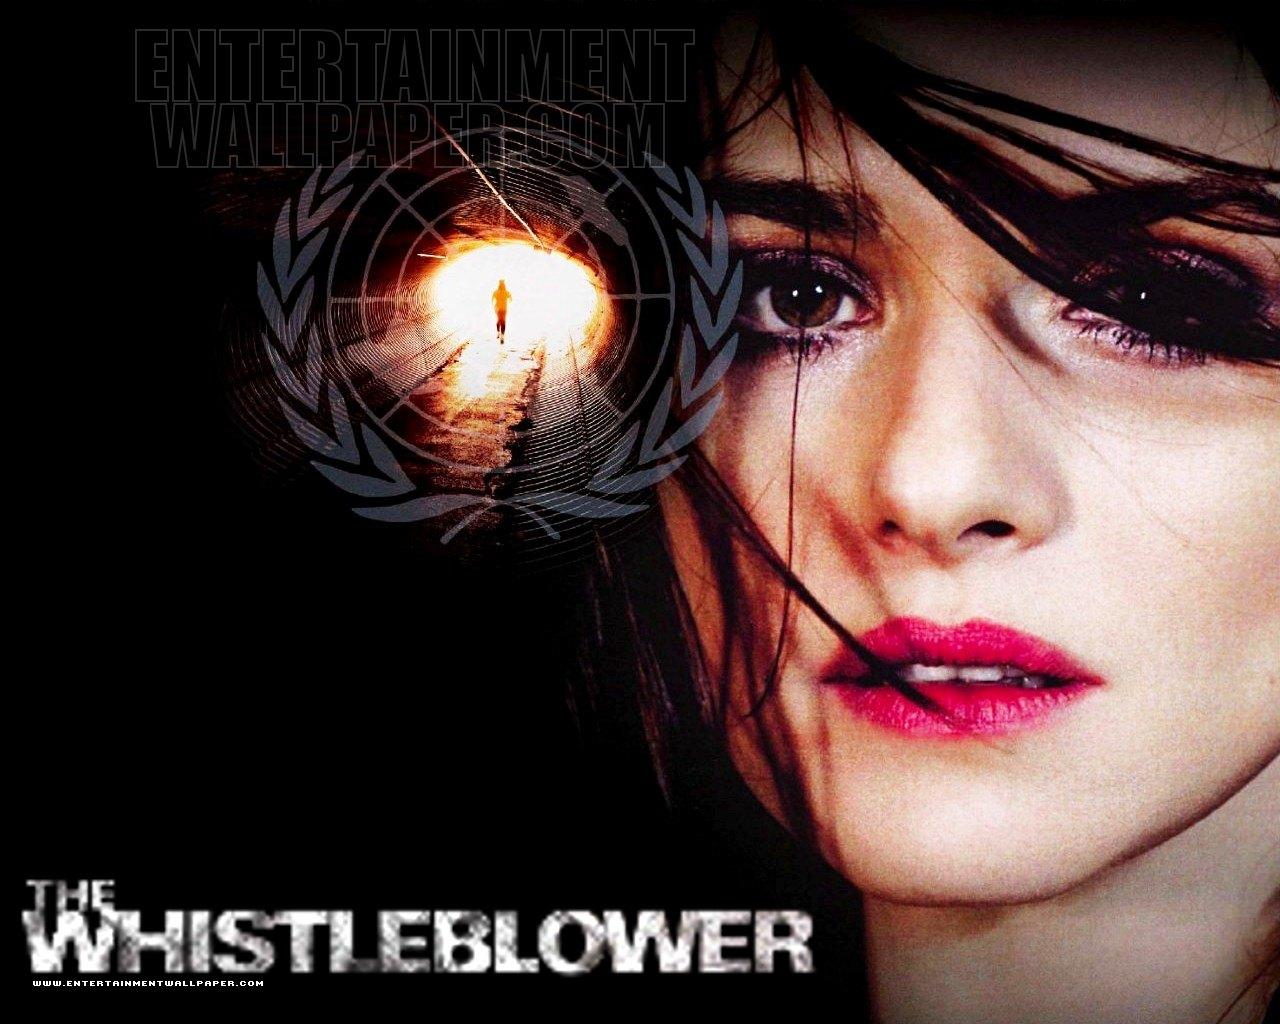 http://2.bp.blogspot.com/-tDGy0arKI8Y/TeKNf6mL-YI/AAAAAAAAIPM/fJBd2coSDL8/s1600/the_whistleblower01.jpg